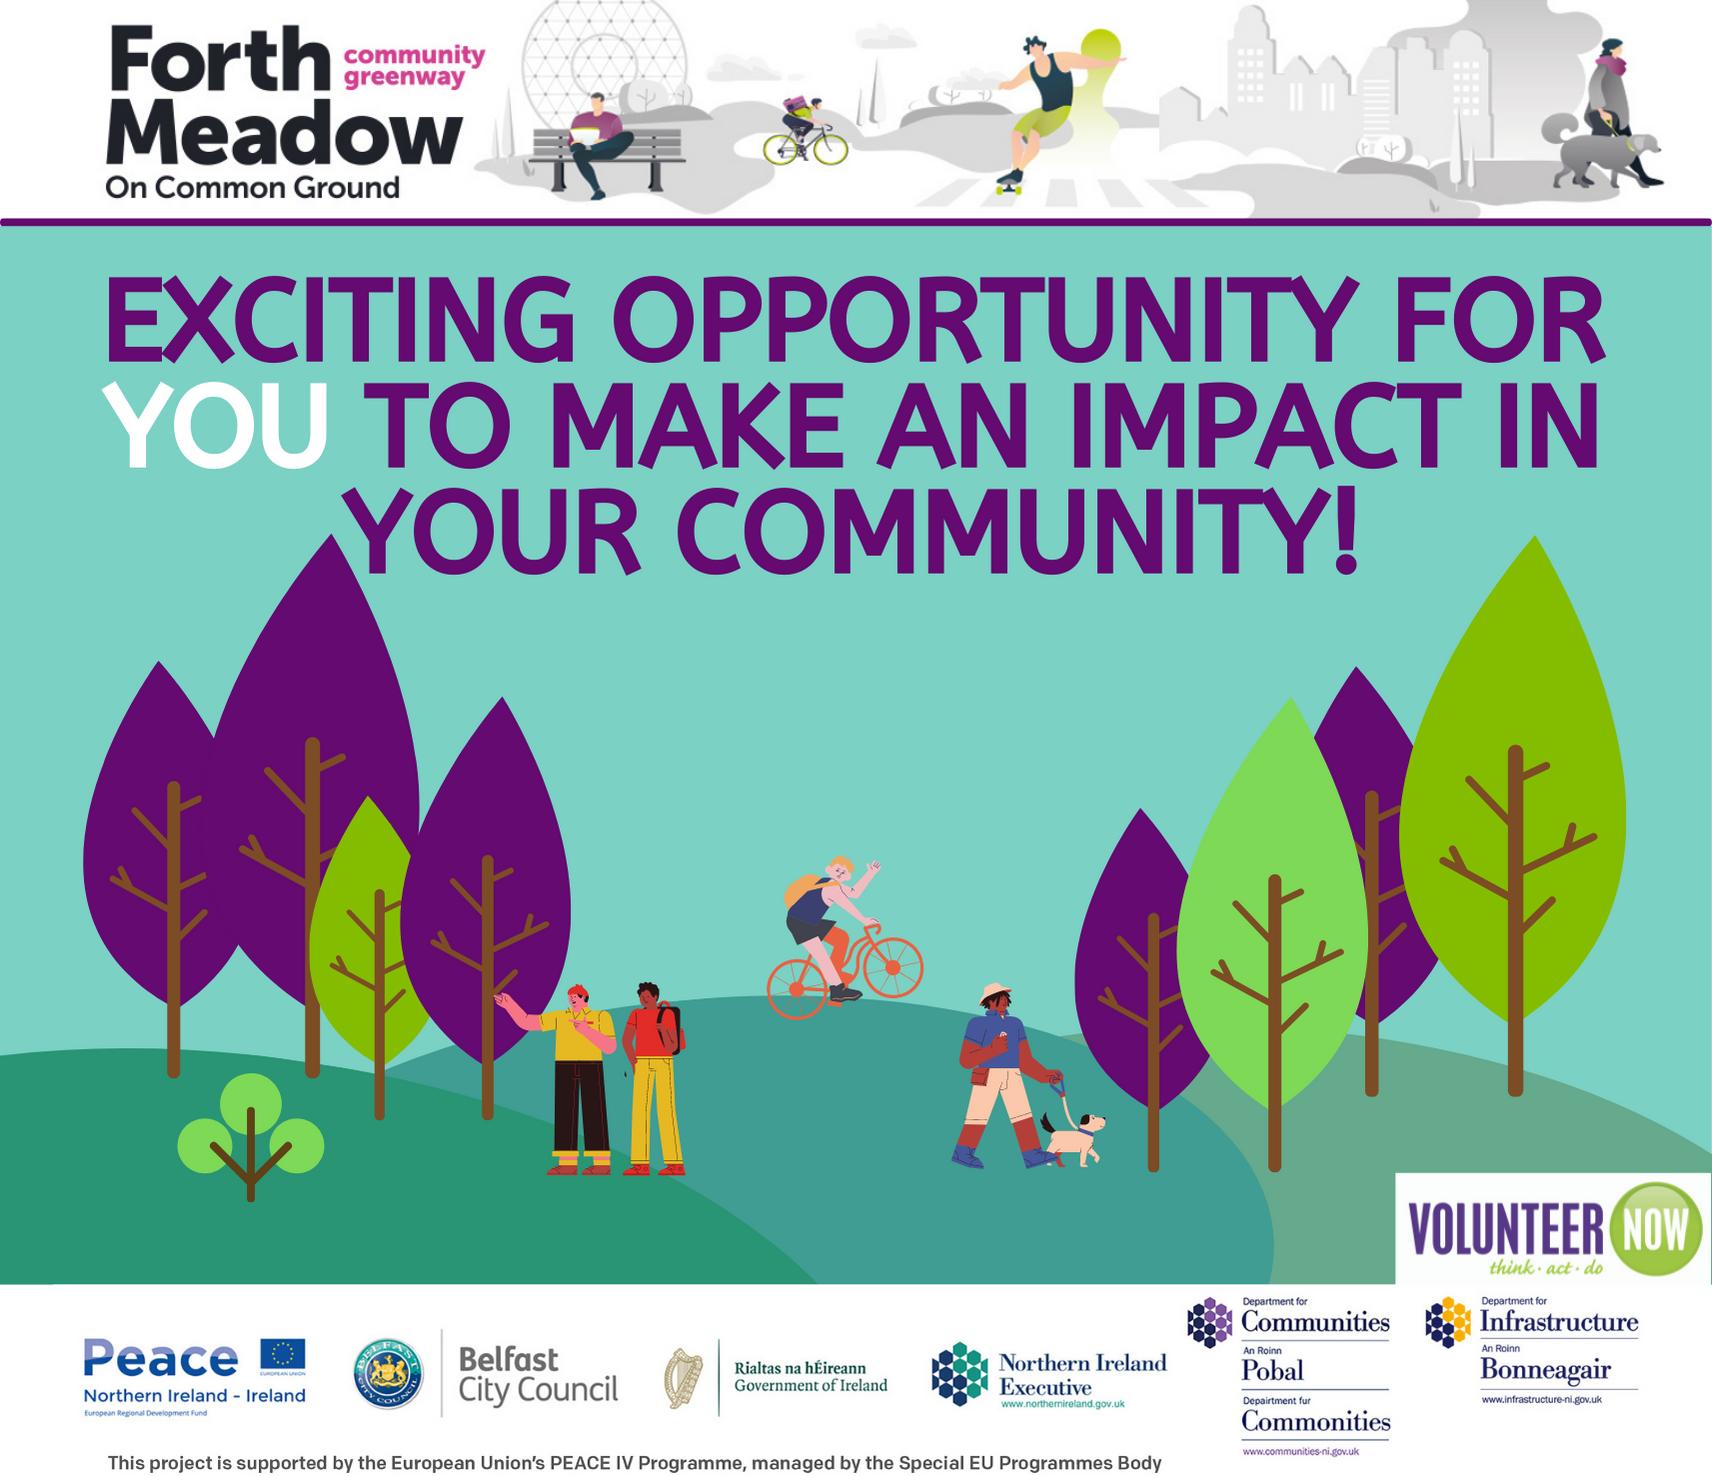 Forth Meadow Community Greenway